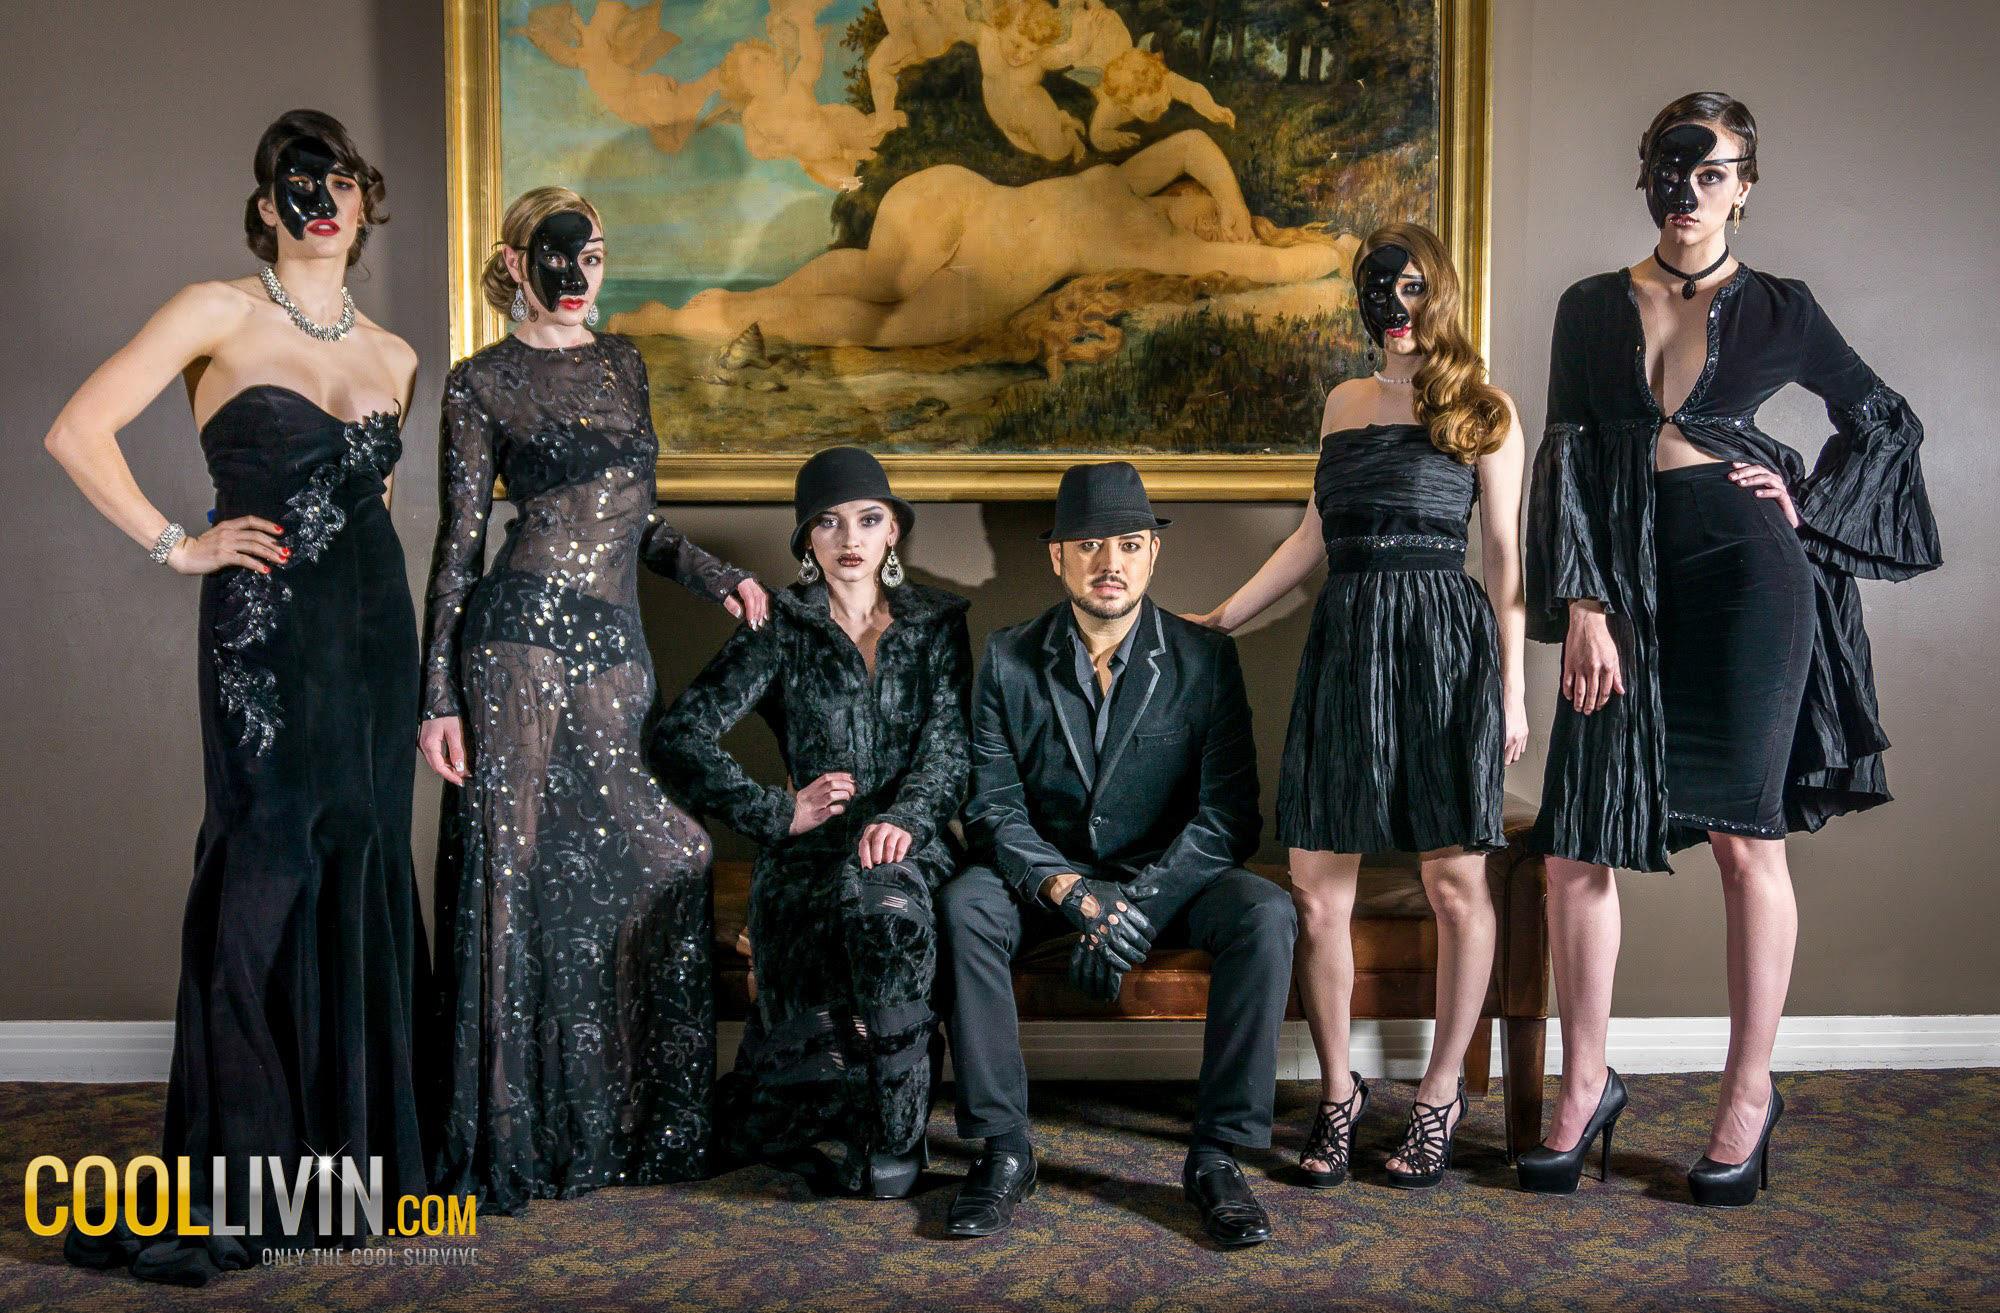 Gino velardi connoisseur of couture coollivin for Define couture fashion